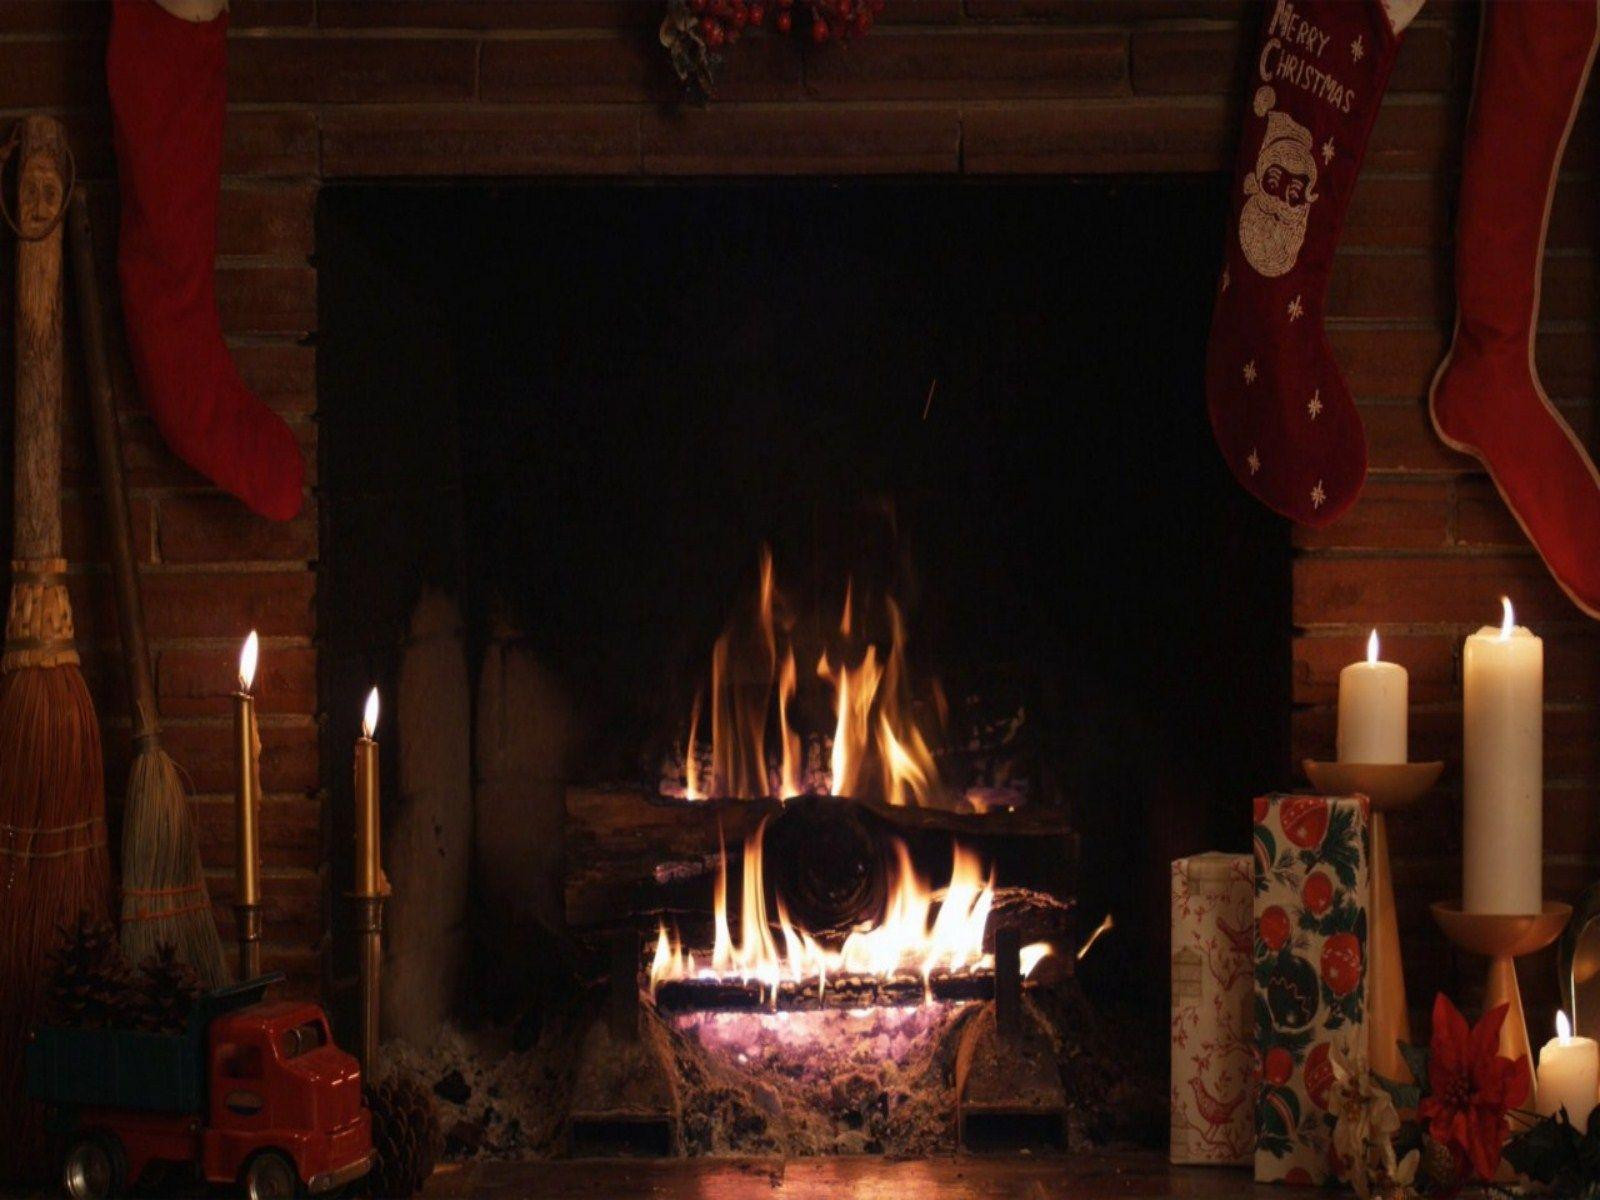 Christmas Fireplace Screensaver  Christmas Fireplace Wallpapers Wallpaper Cave